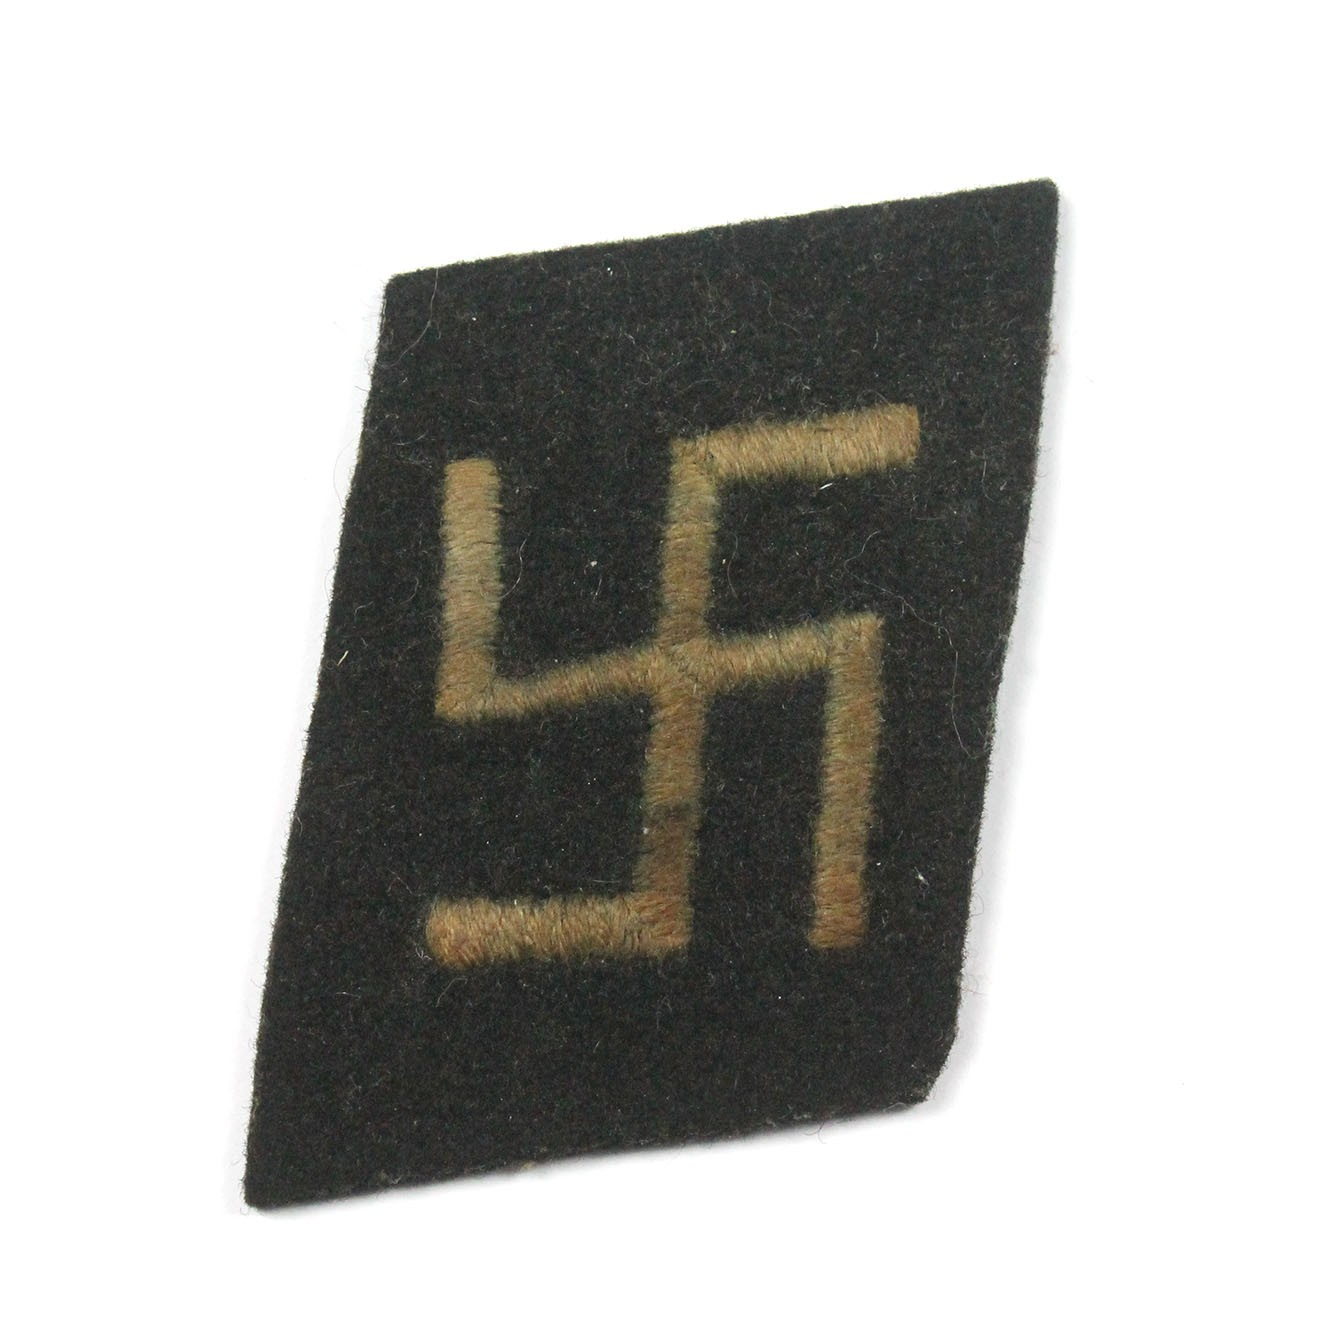 DA-LITZEN SS LATVIA 2